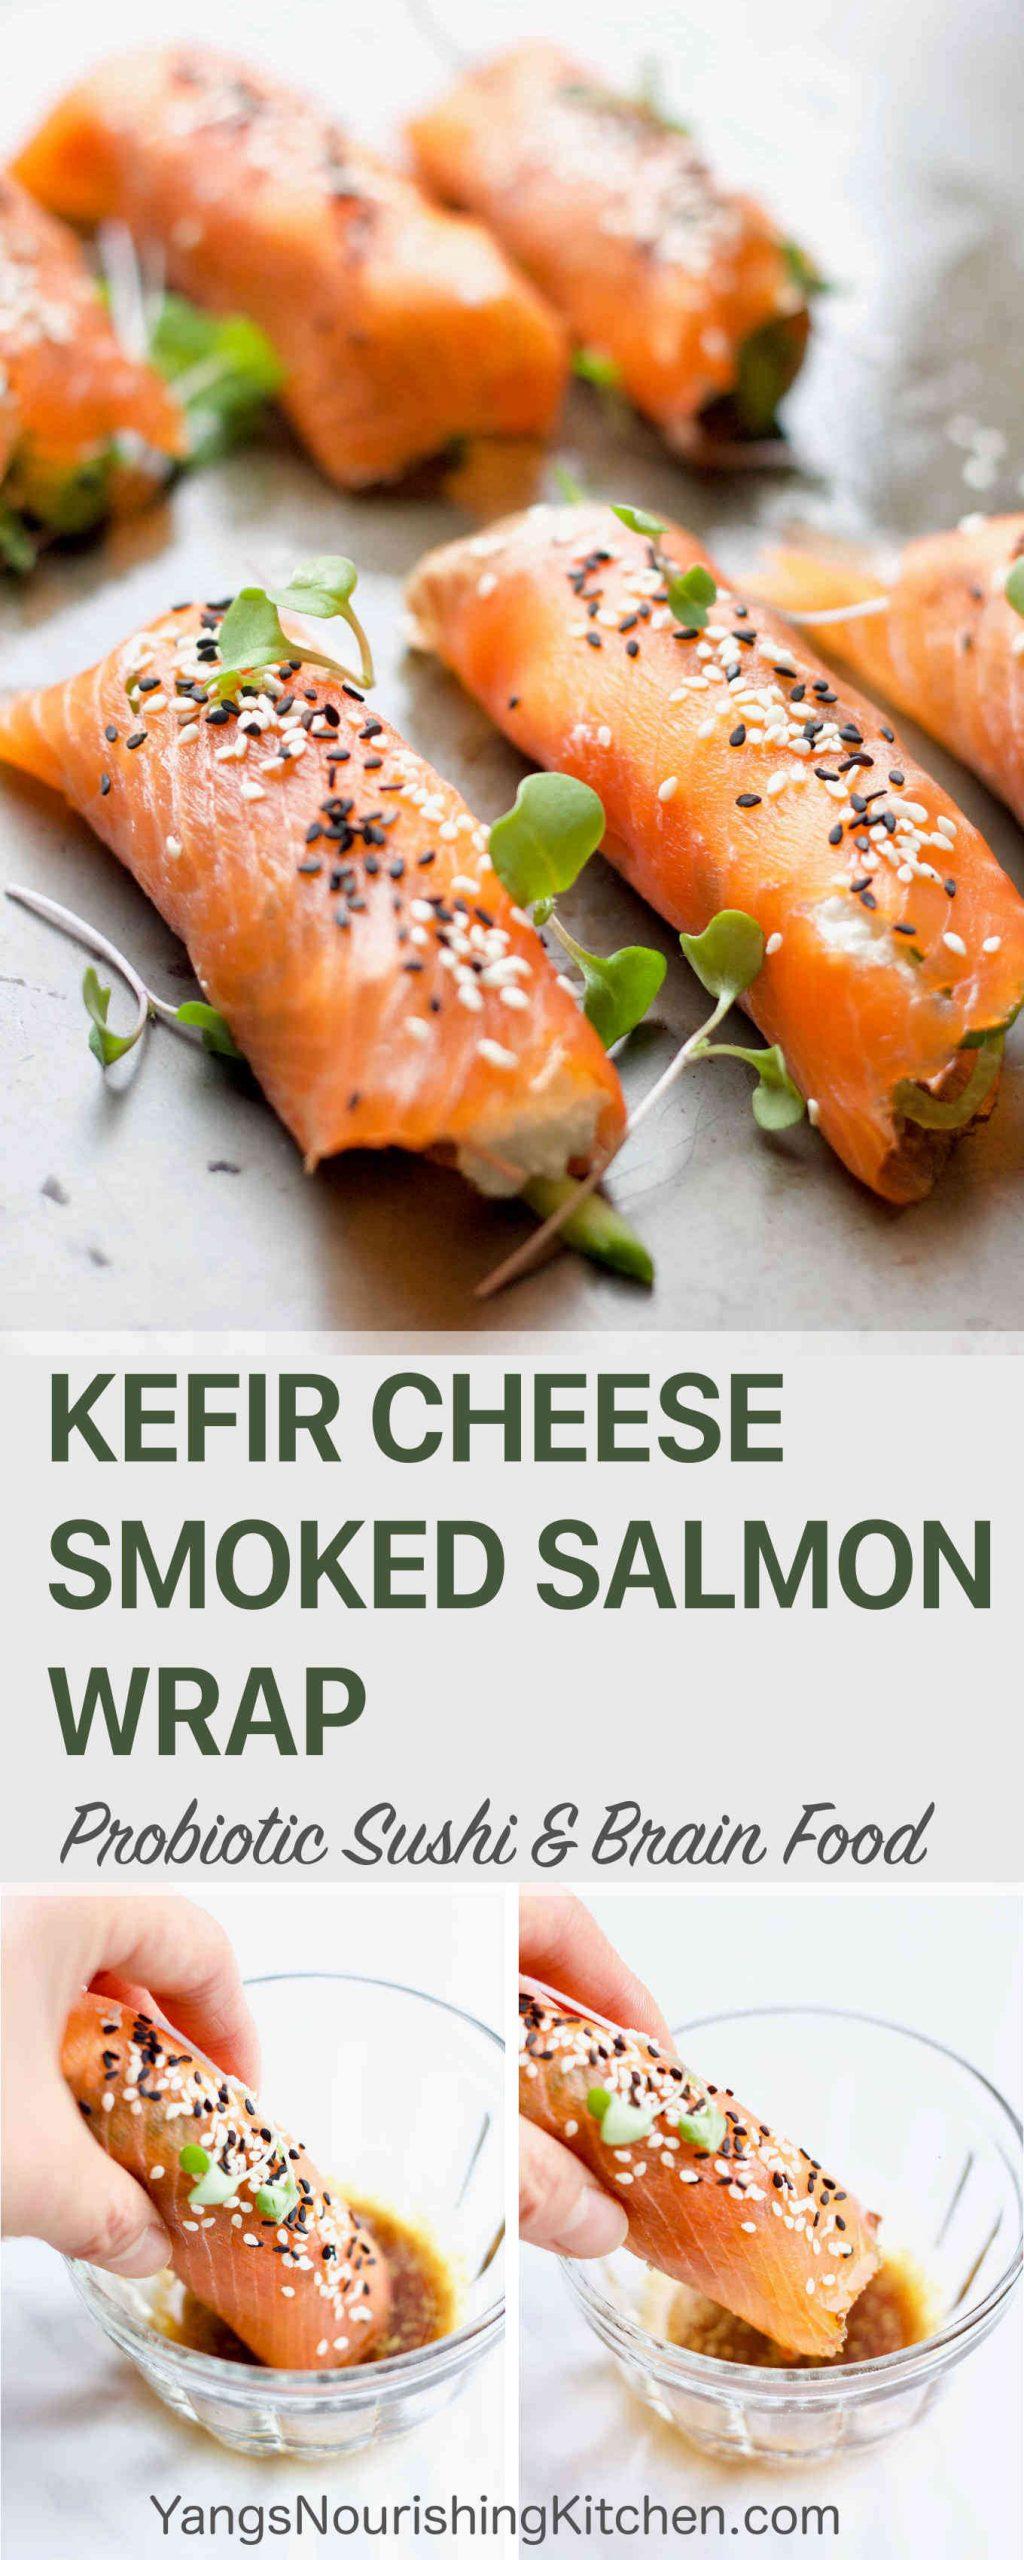 Kefir Cheese Smoked Salmon Wrap (Probiotic Sushi + Brain Food)